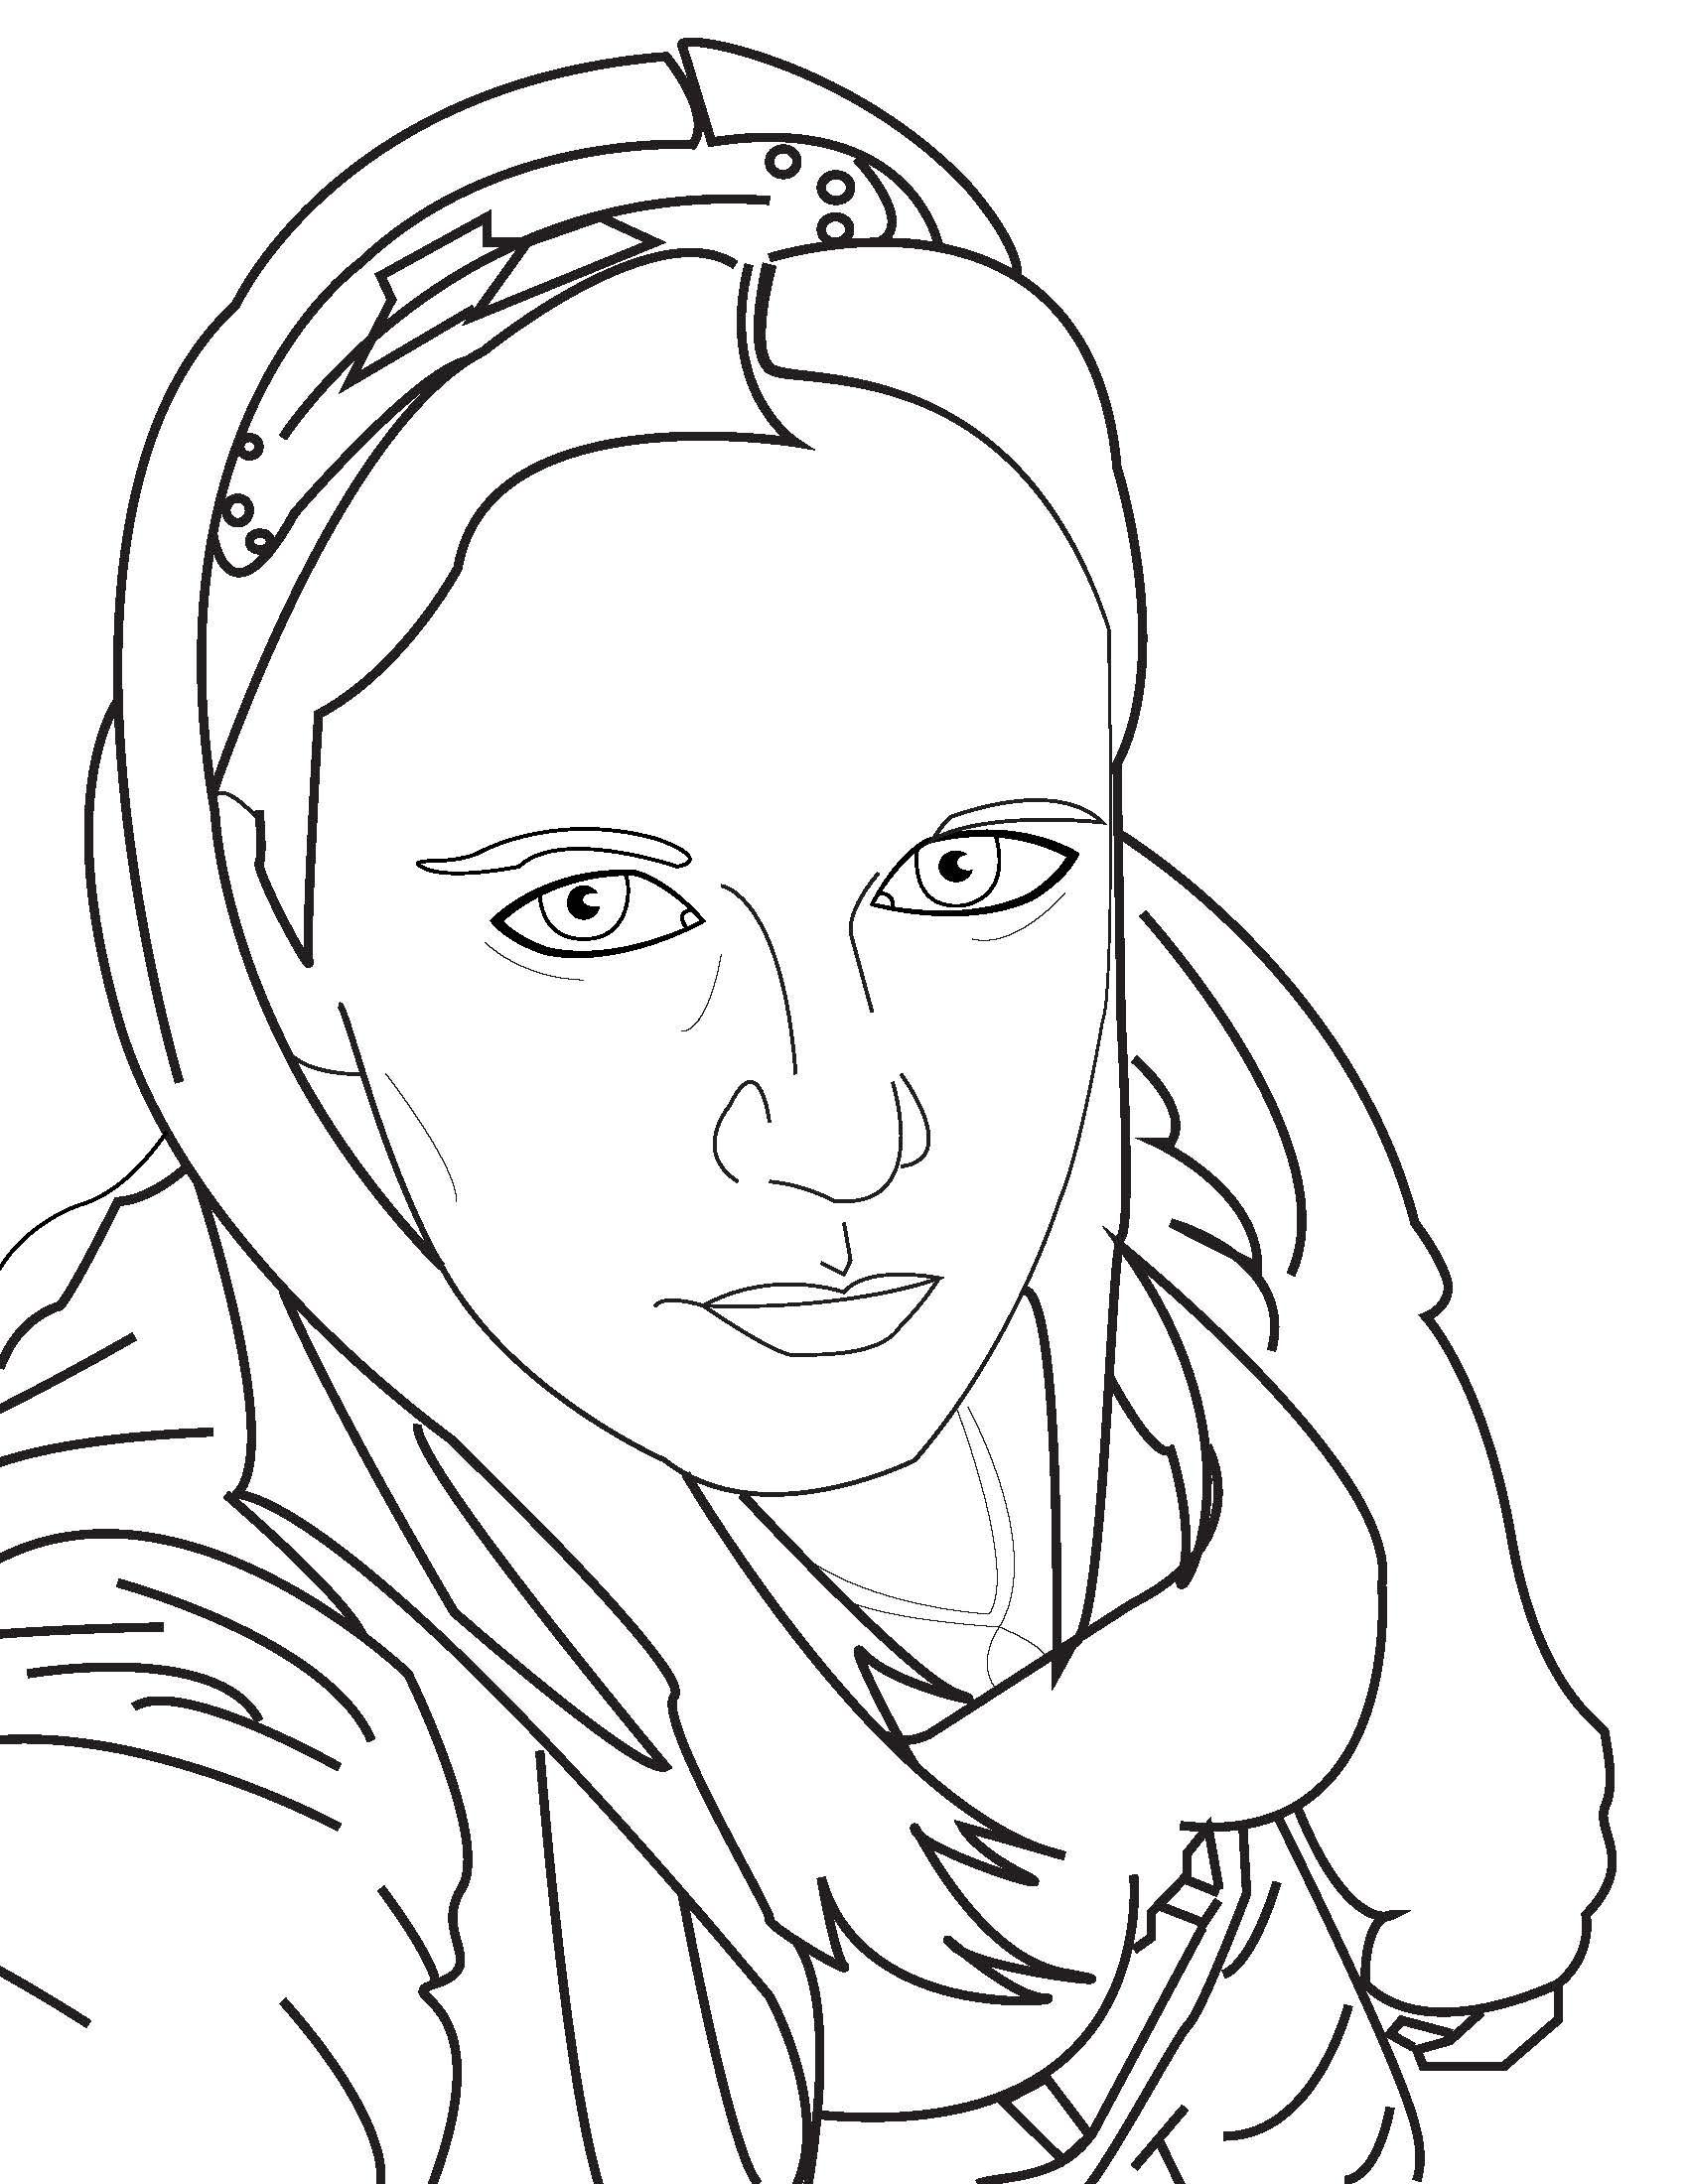 Self Portrait Lineart by SparklingKajhit on DeviantArt